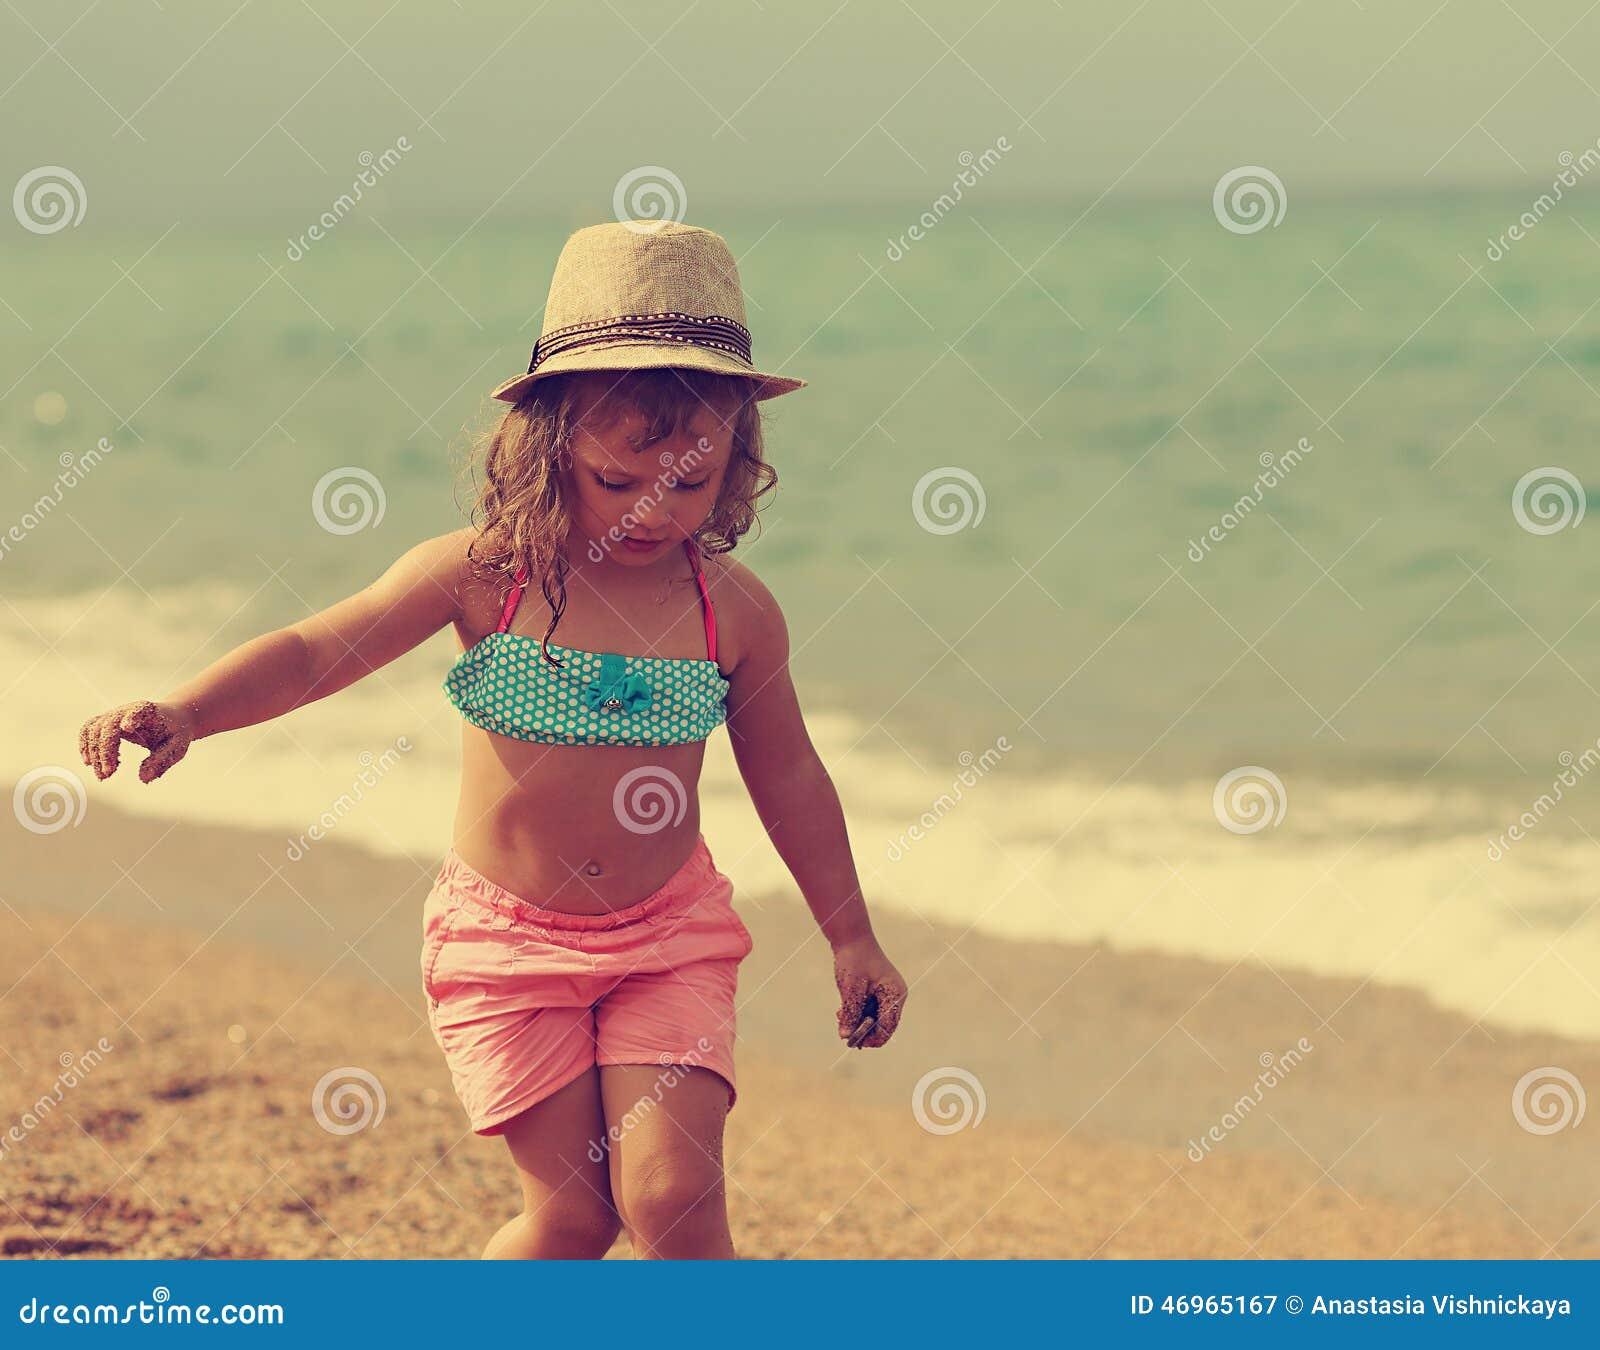 beautiful free kid girl walking in the beach instagram